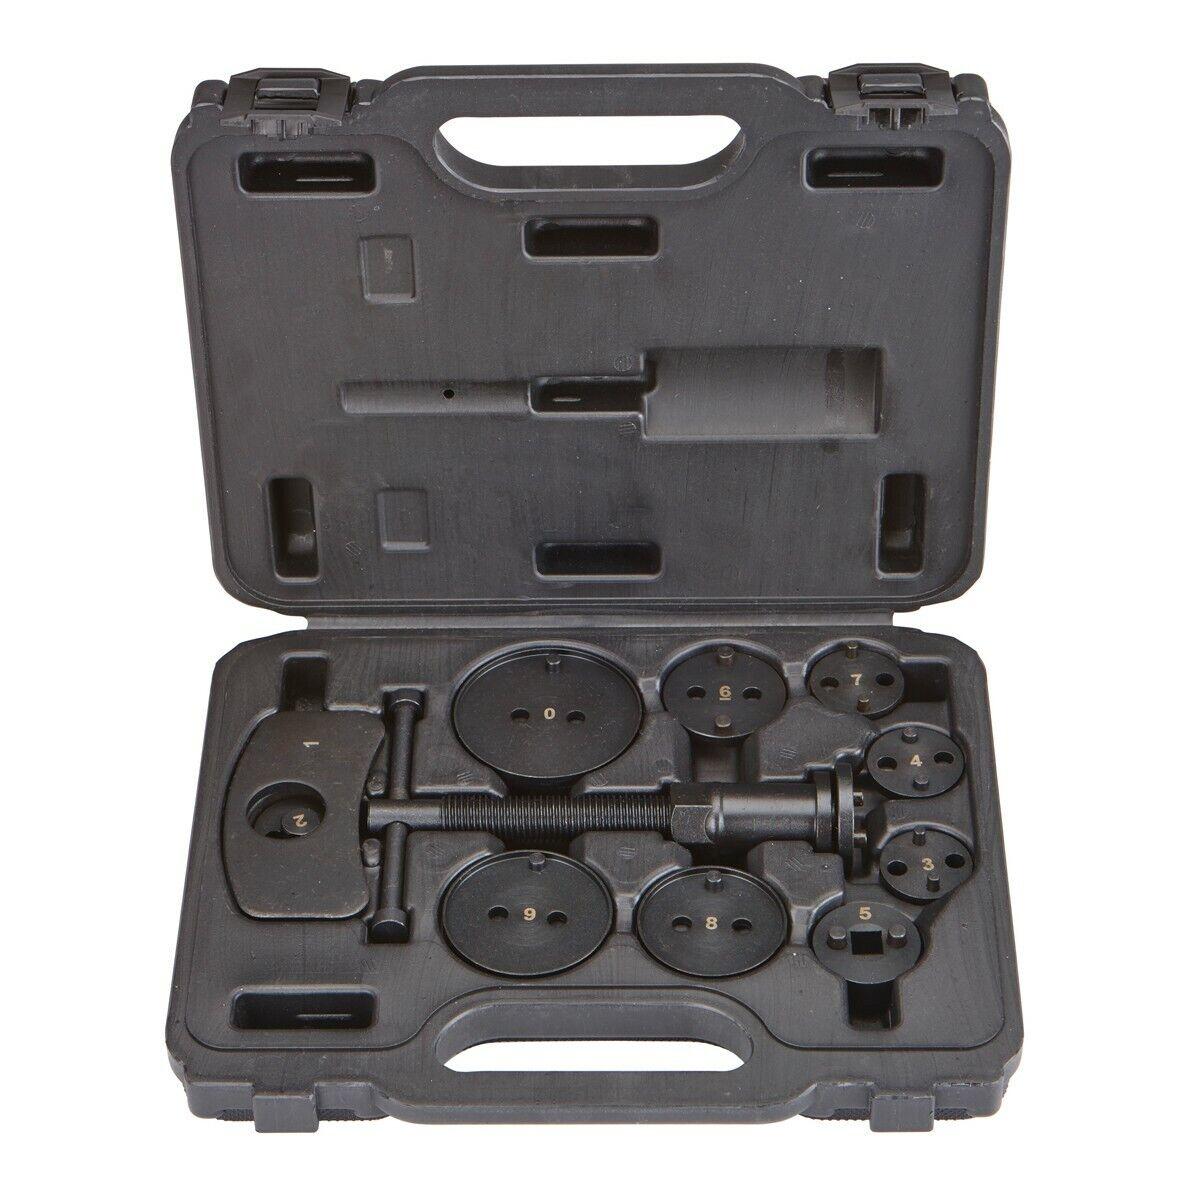 Maddox Pro Disc Brake Pad and Caliper Service Tool Kit 11 Pc.